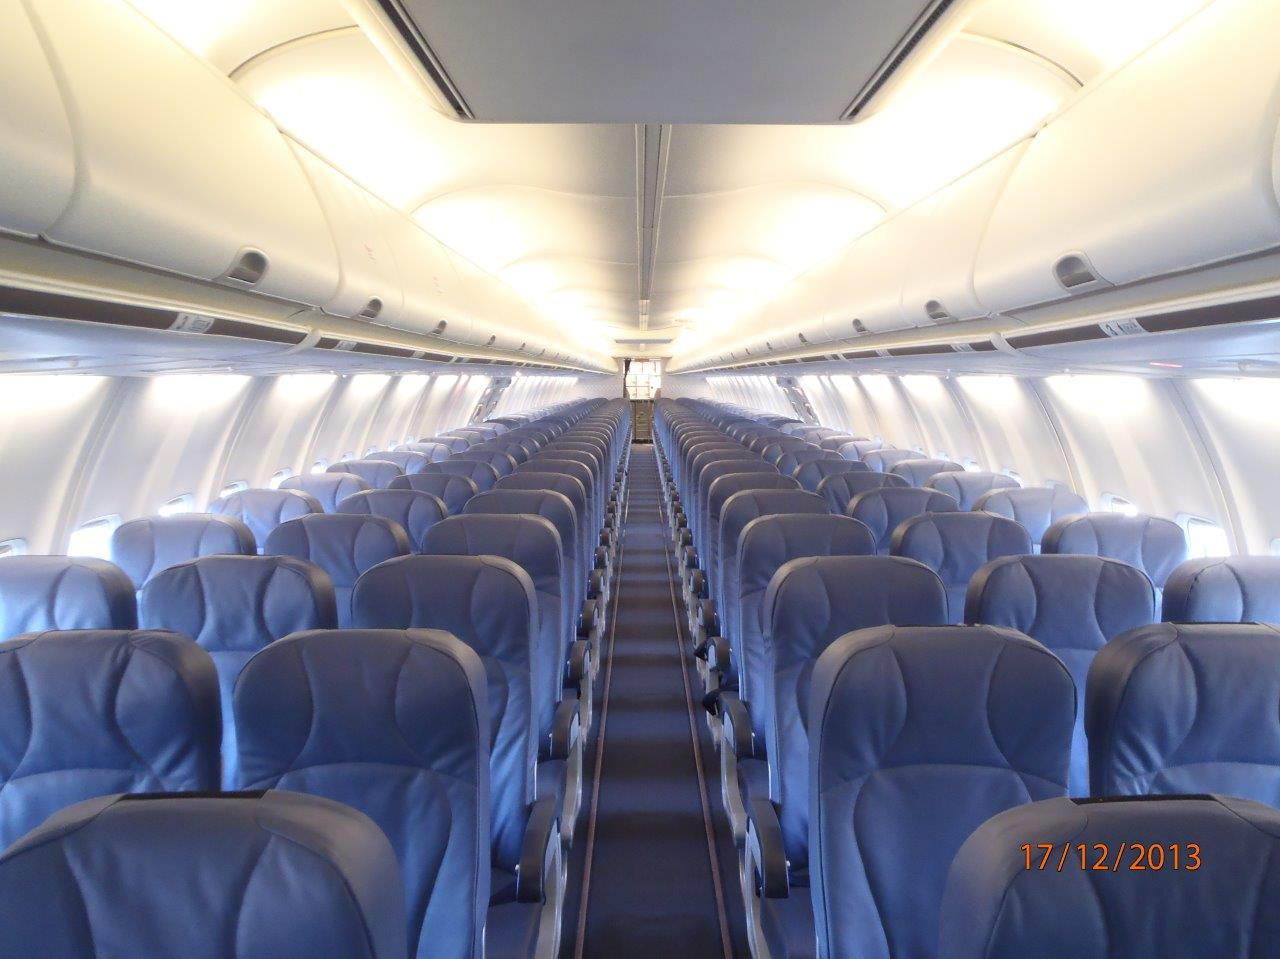 Royal flight схема салона фото 752